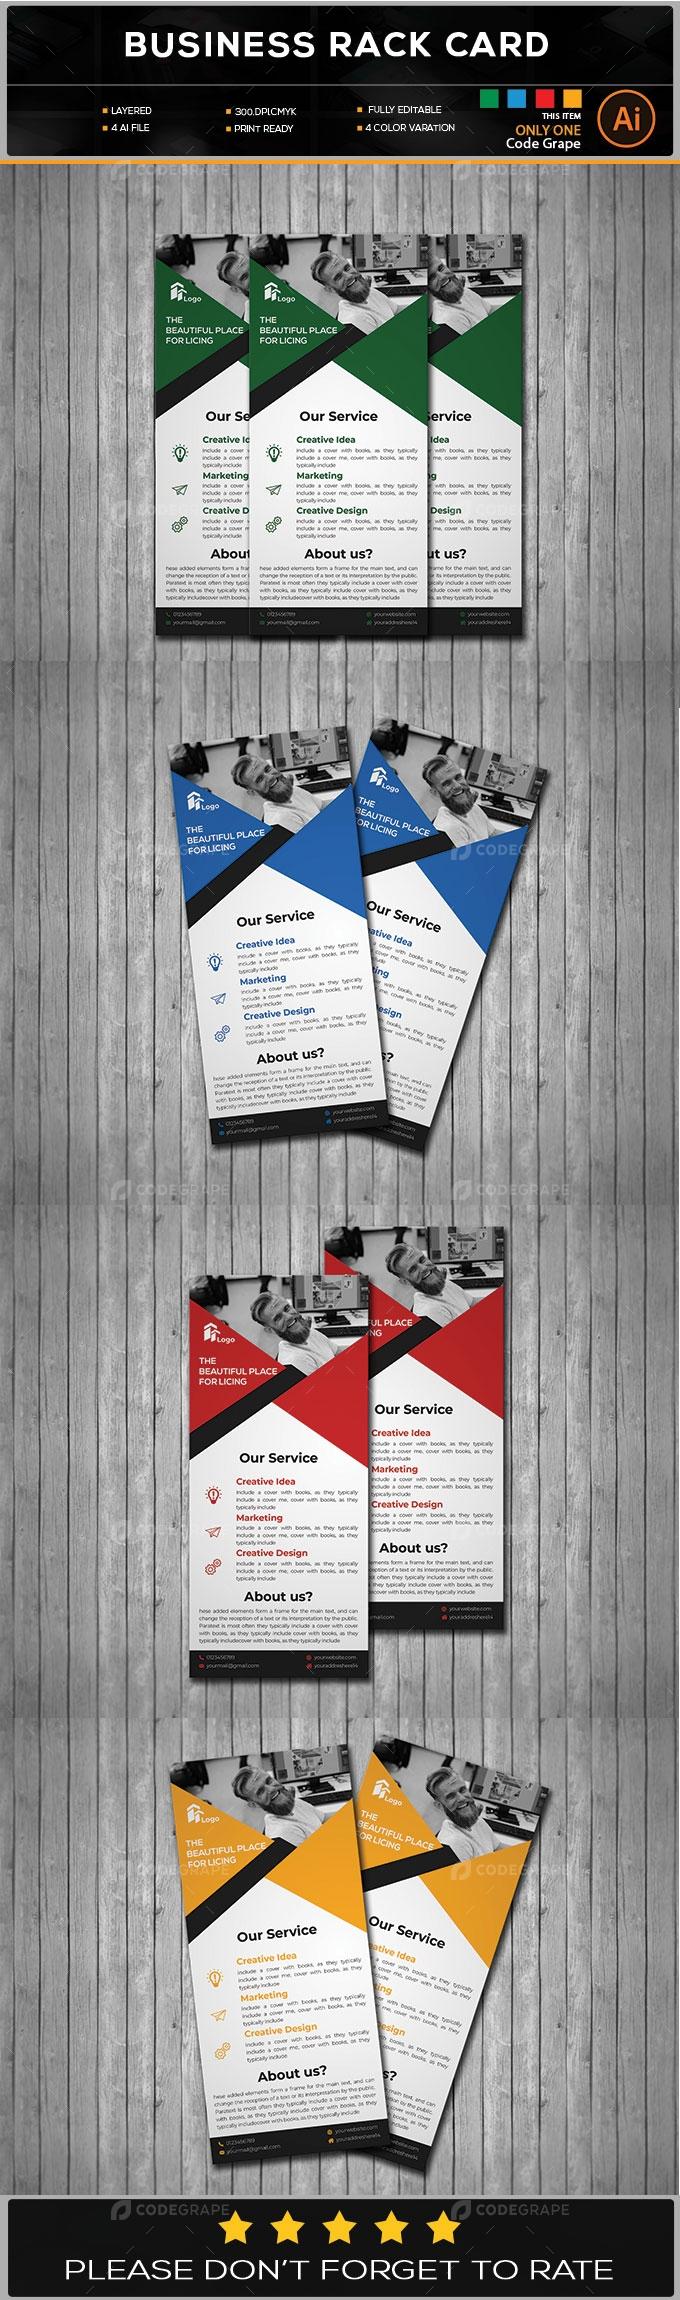 Business Rack Card Design